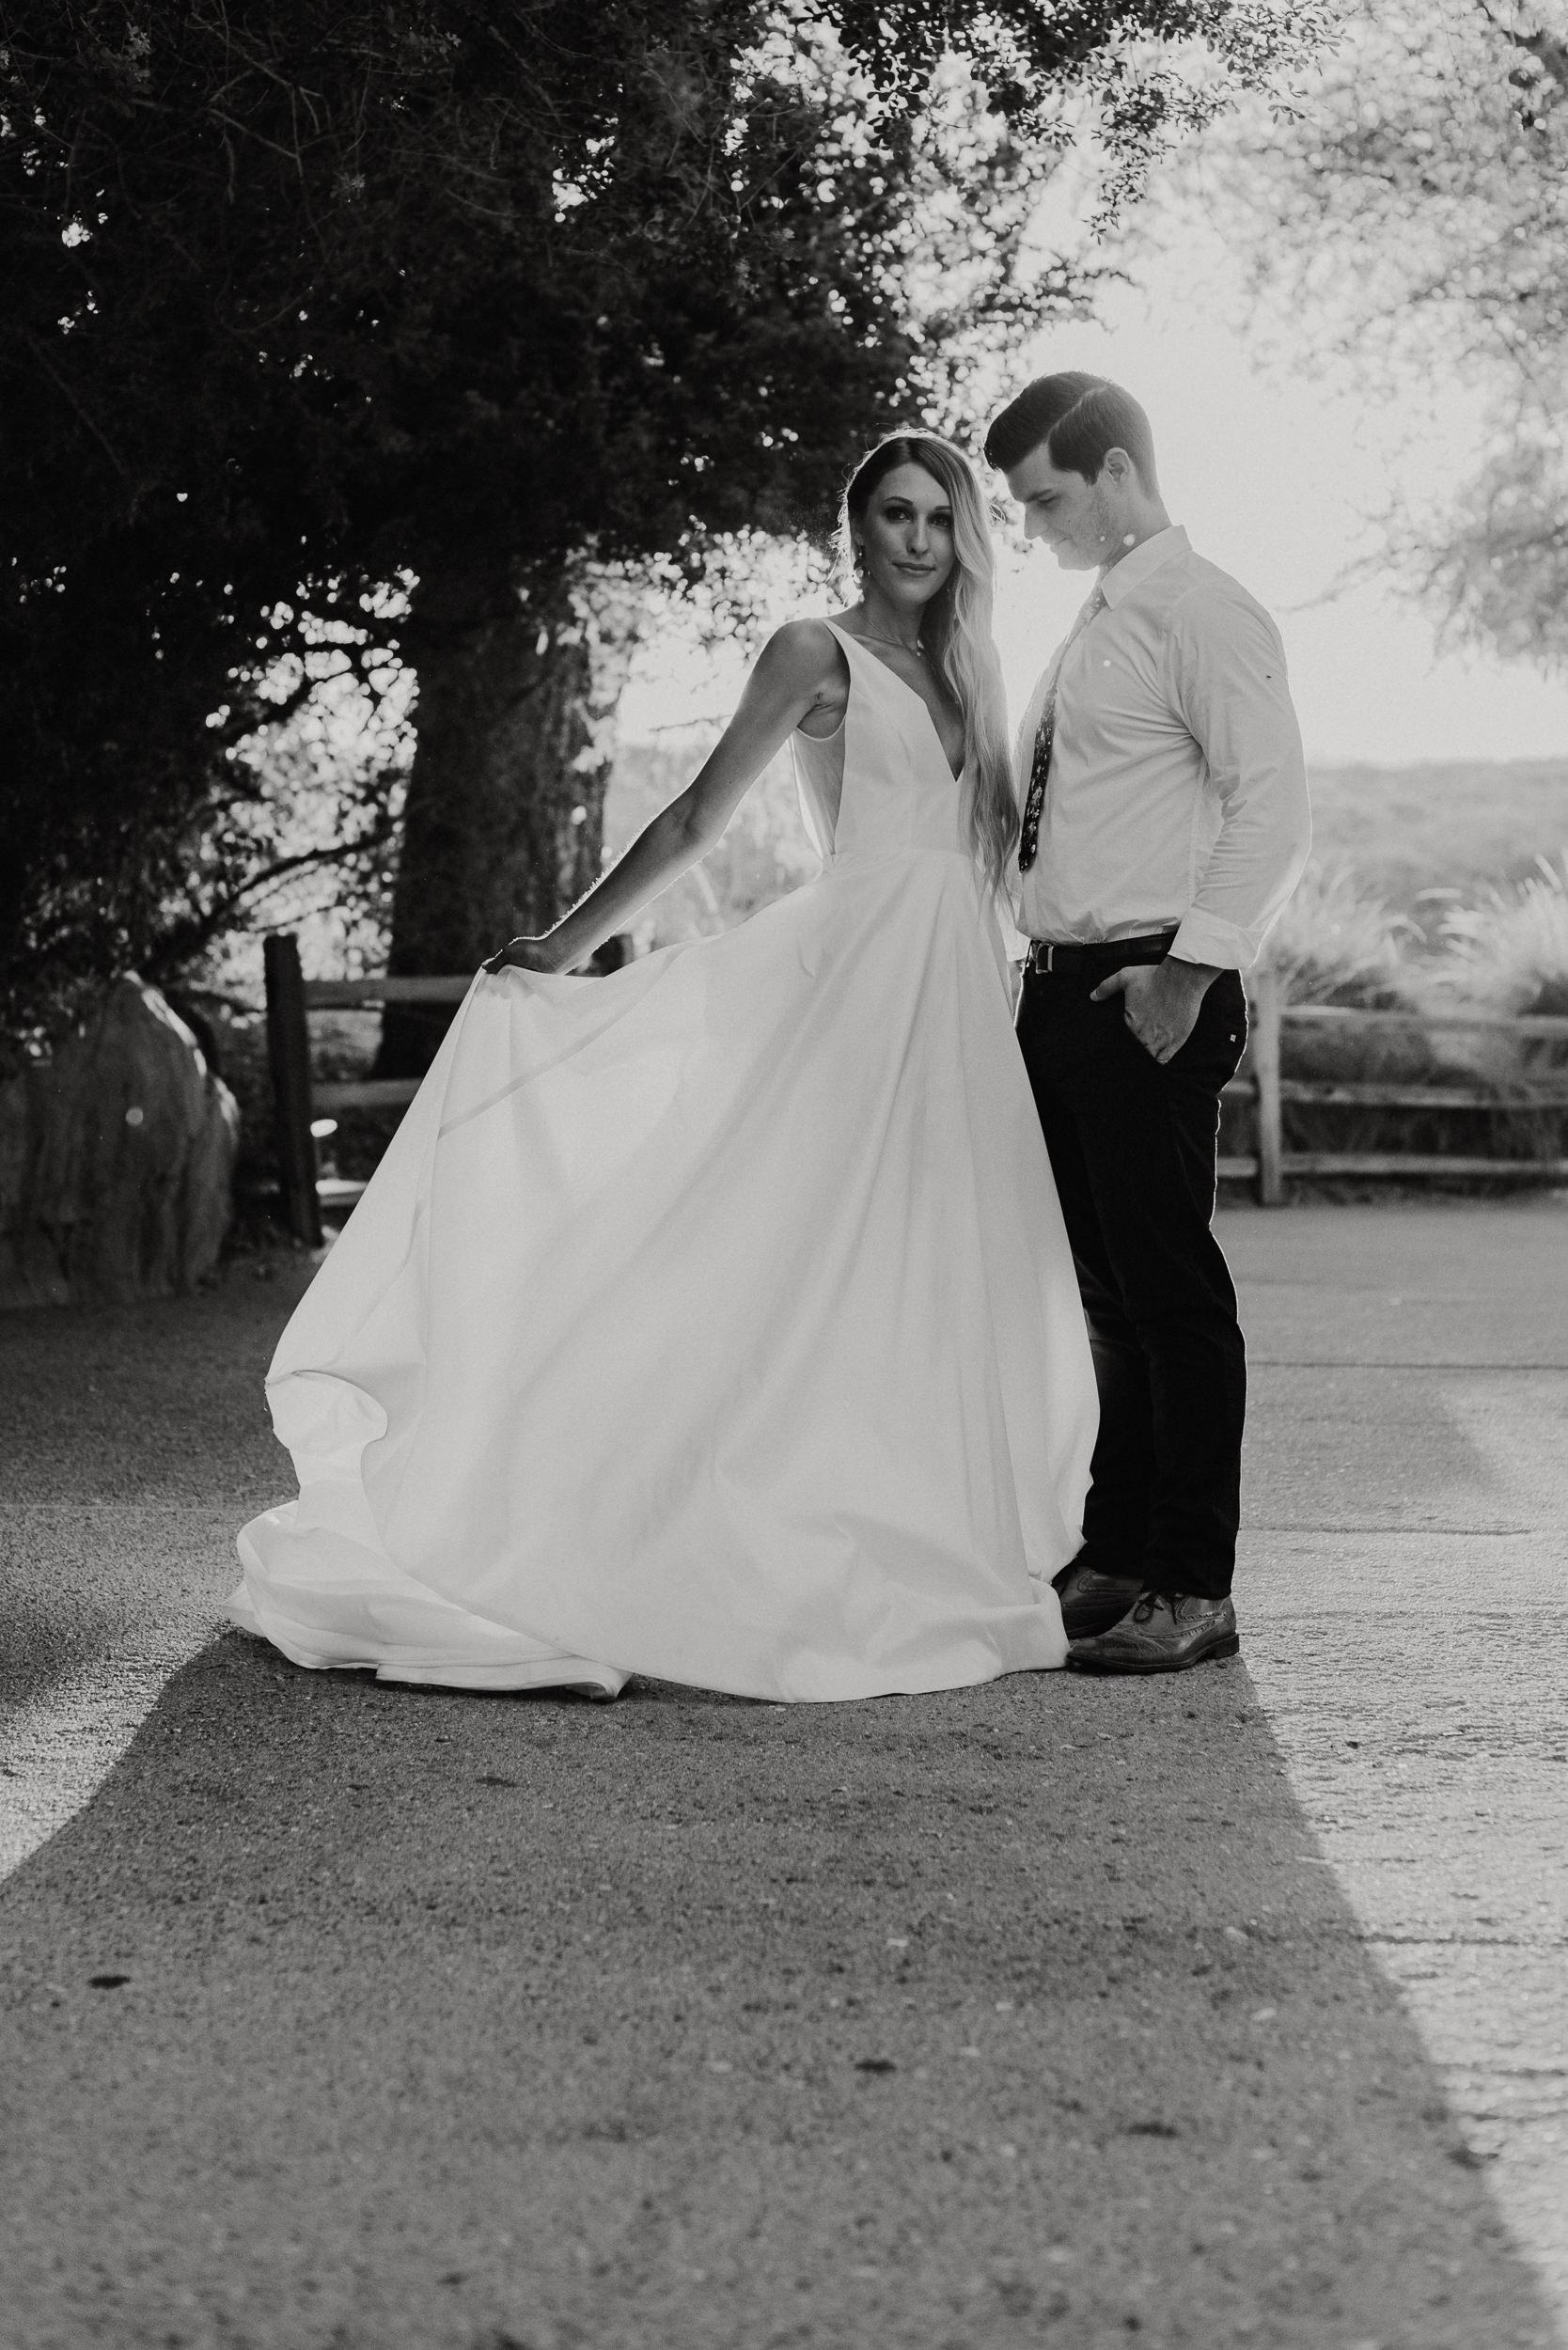 sChelsie + Chris - The Desert Shootout Wedding Romantics at The Living Desert-153.jpg